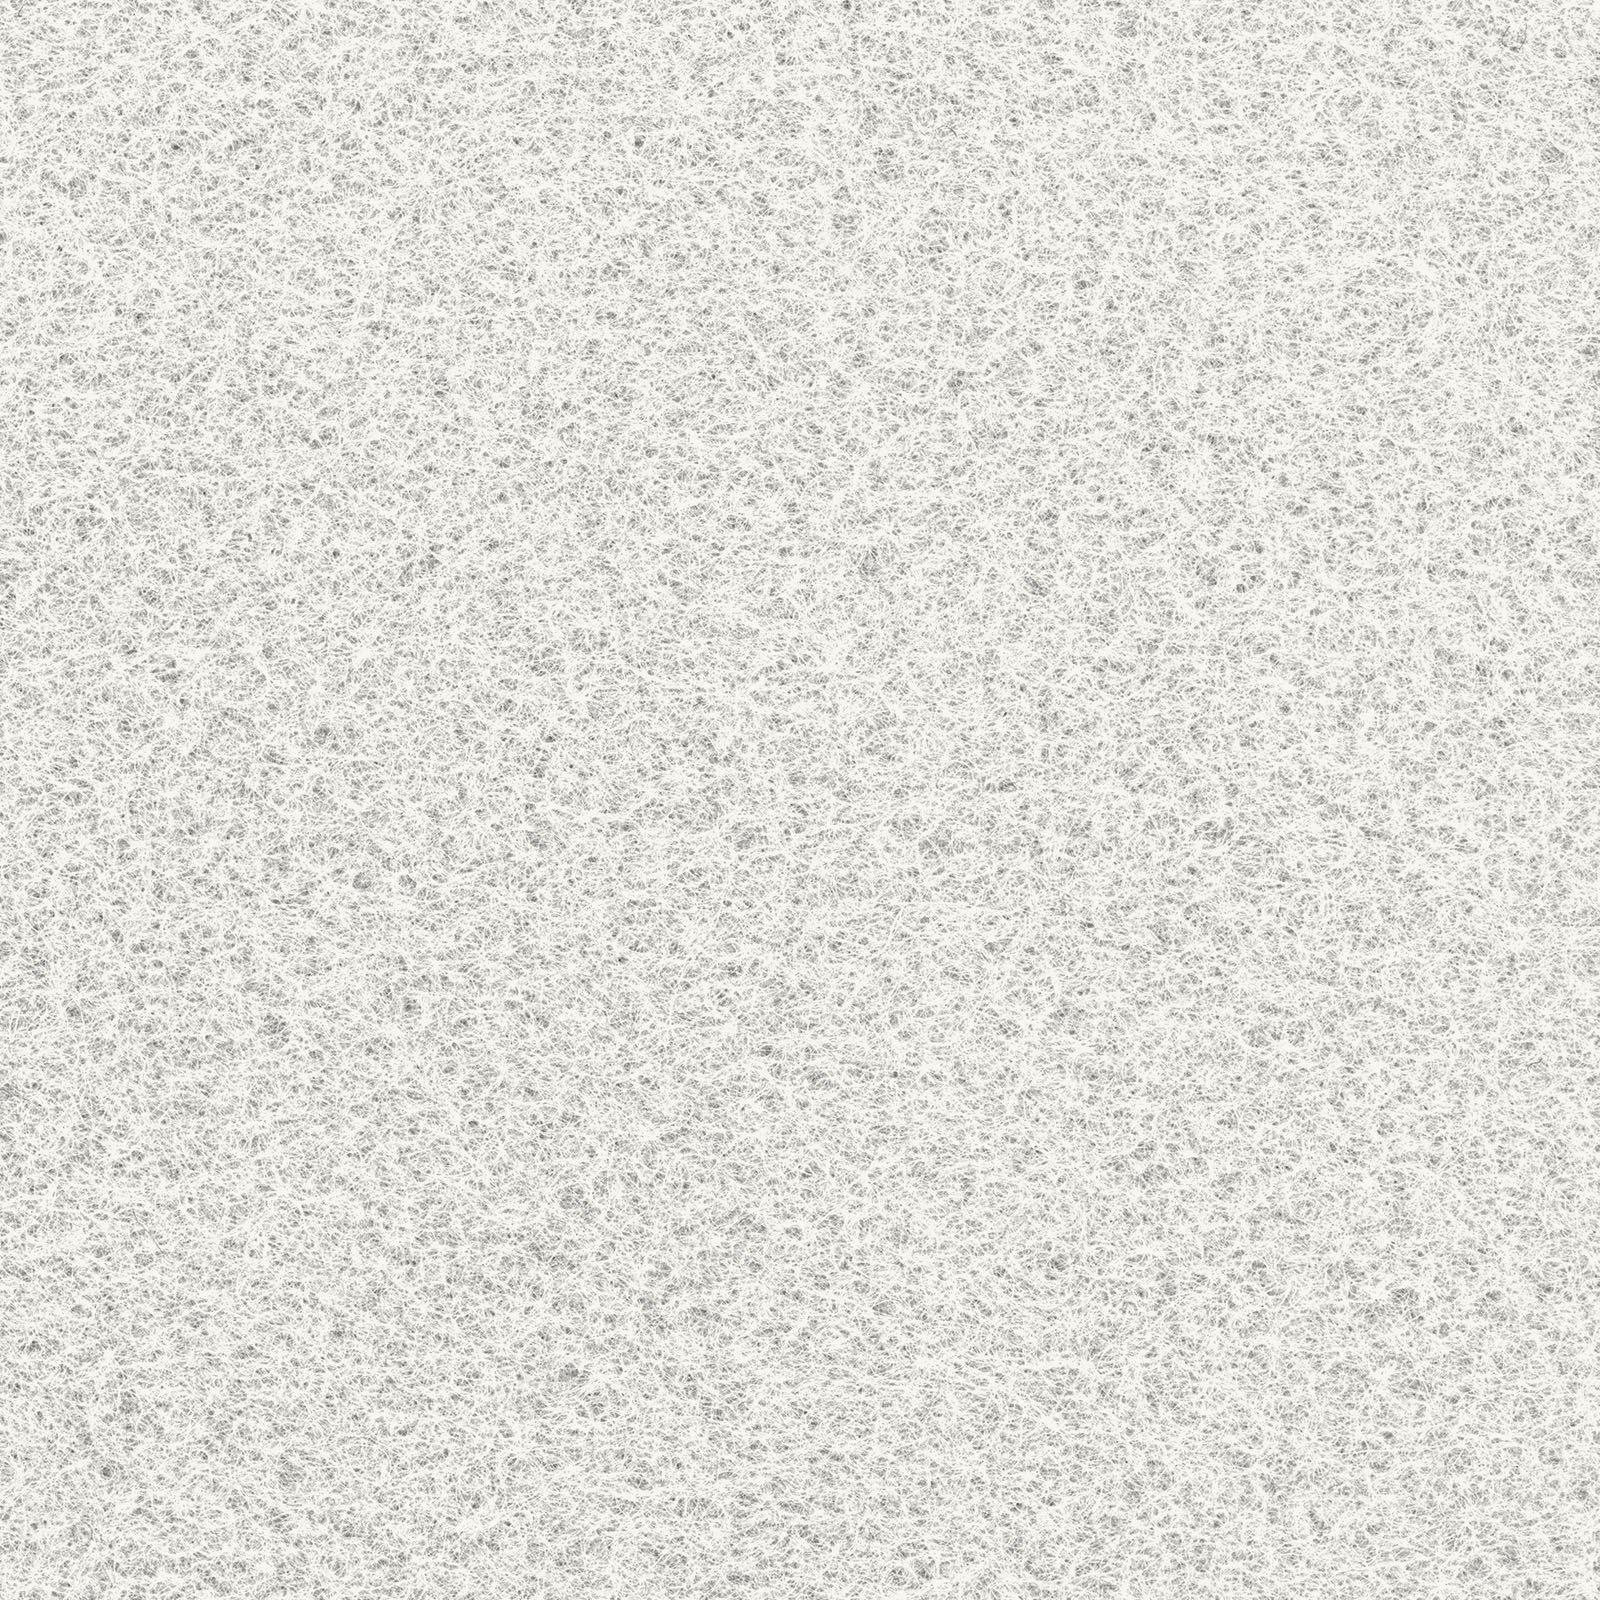 Wool Felt 35/65 - White<br/>National Nonwovens